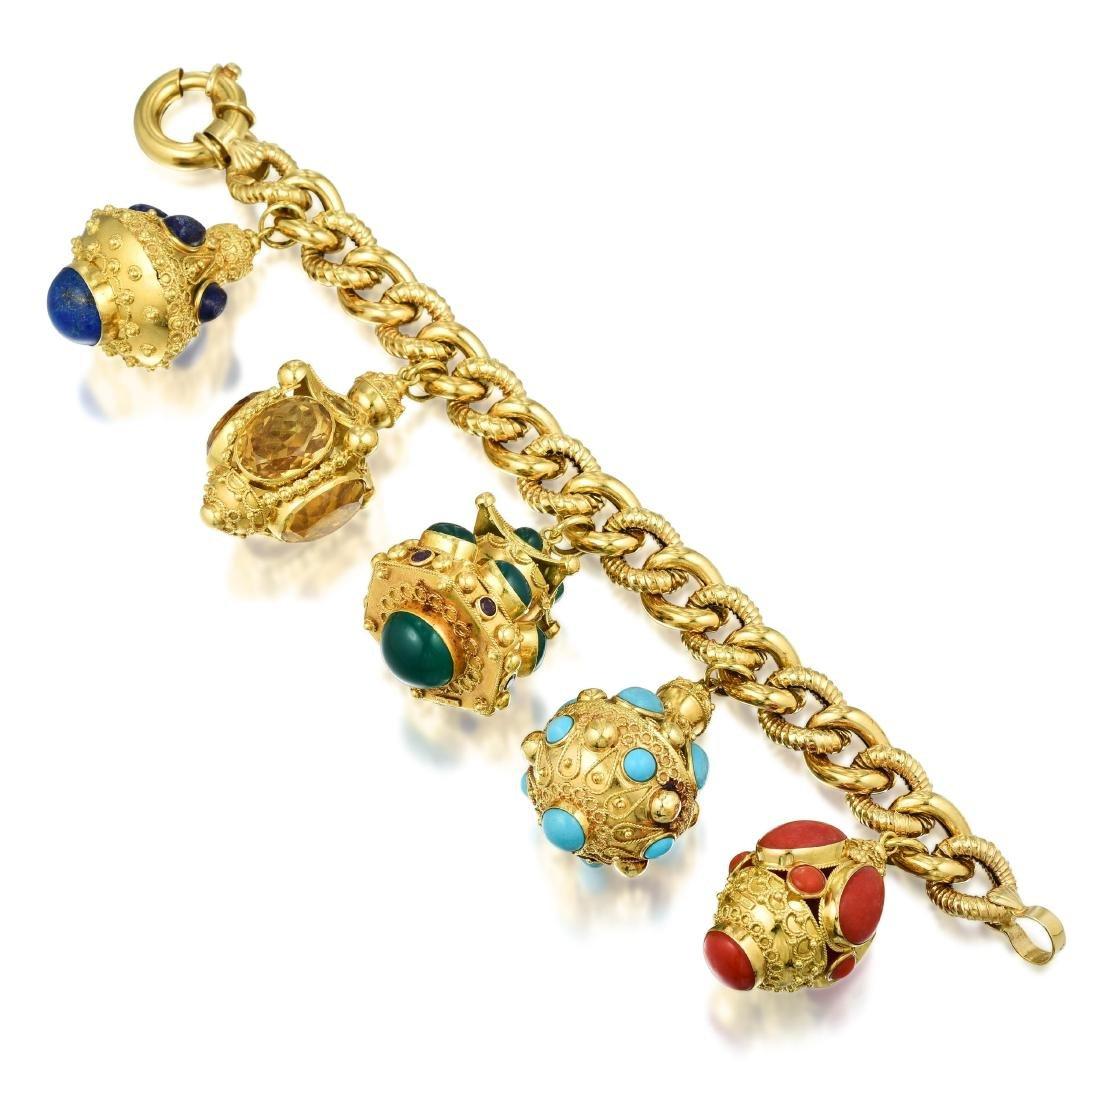 A Multi-Gemstone Charm Bracelet, Italian - 2